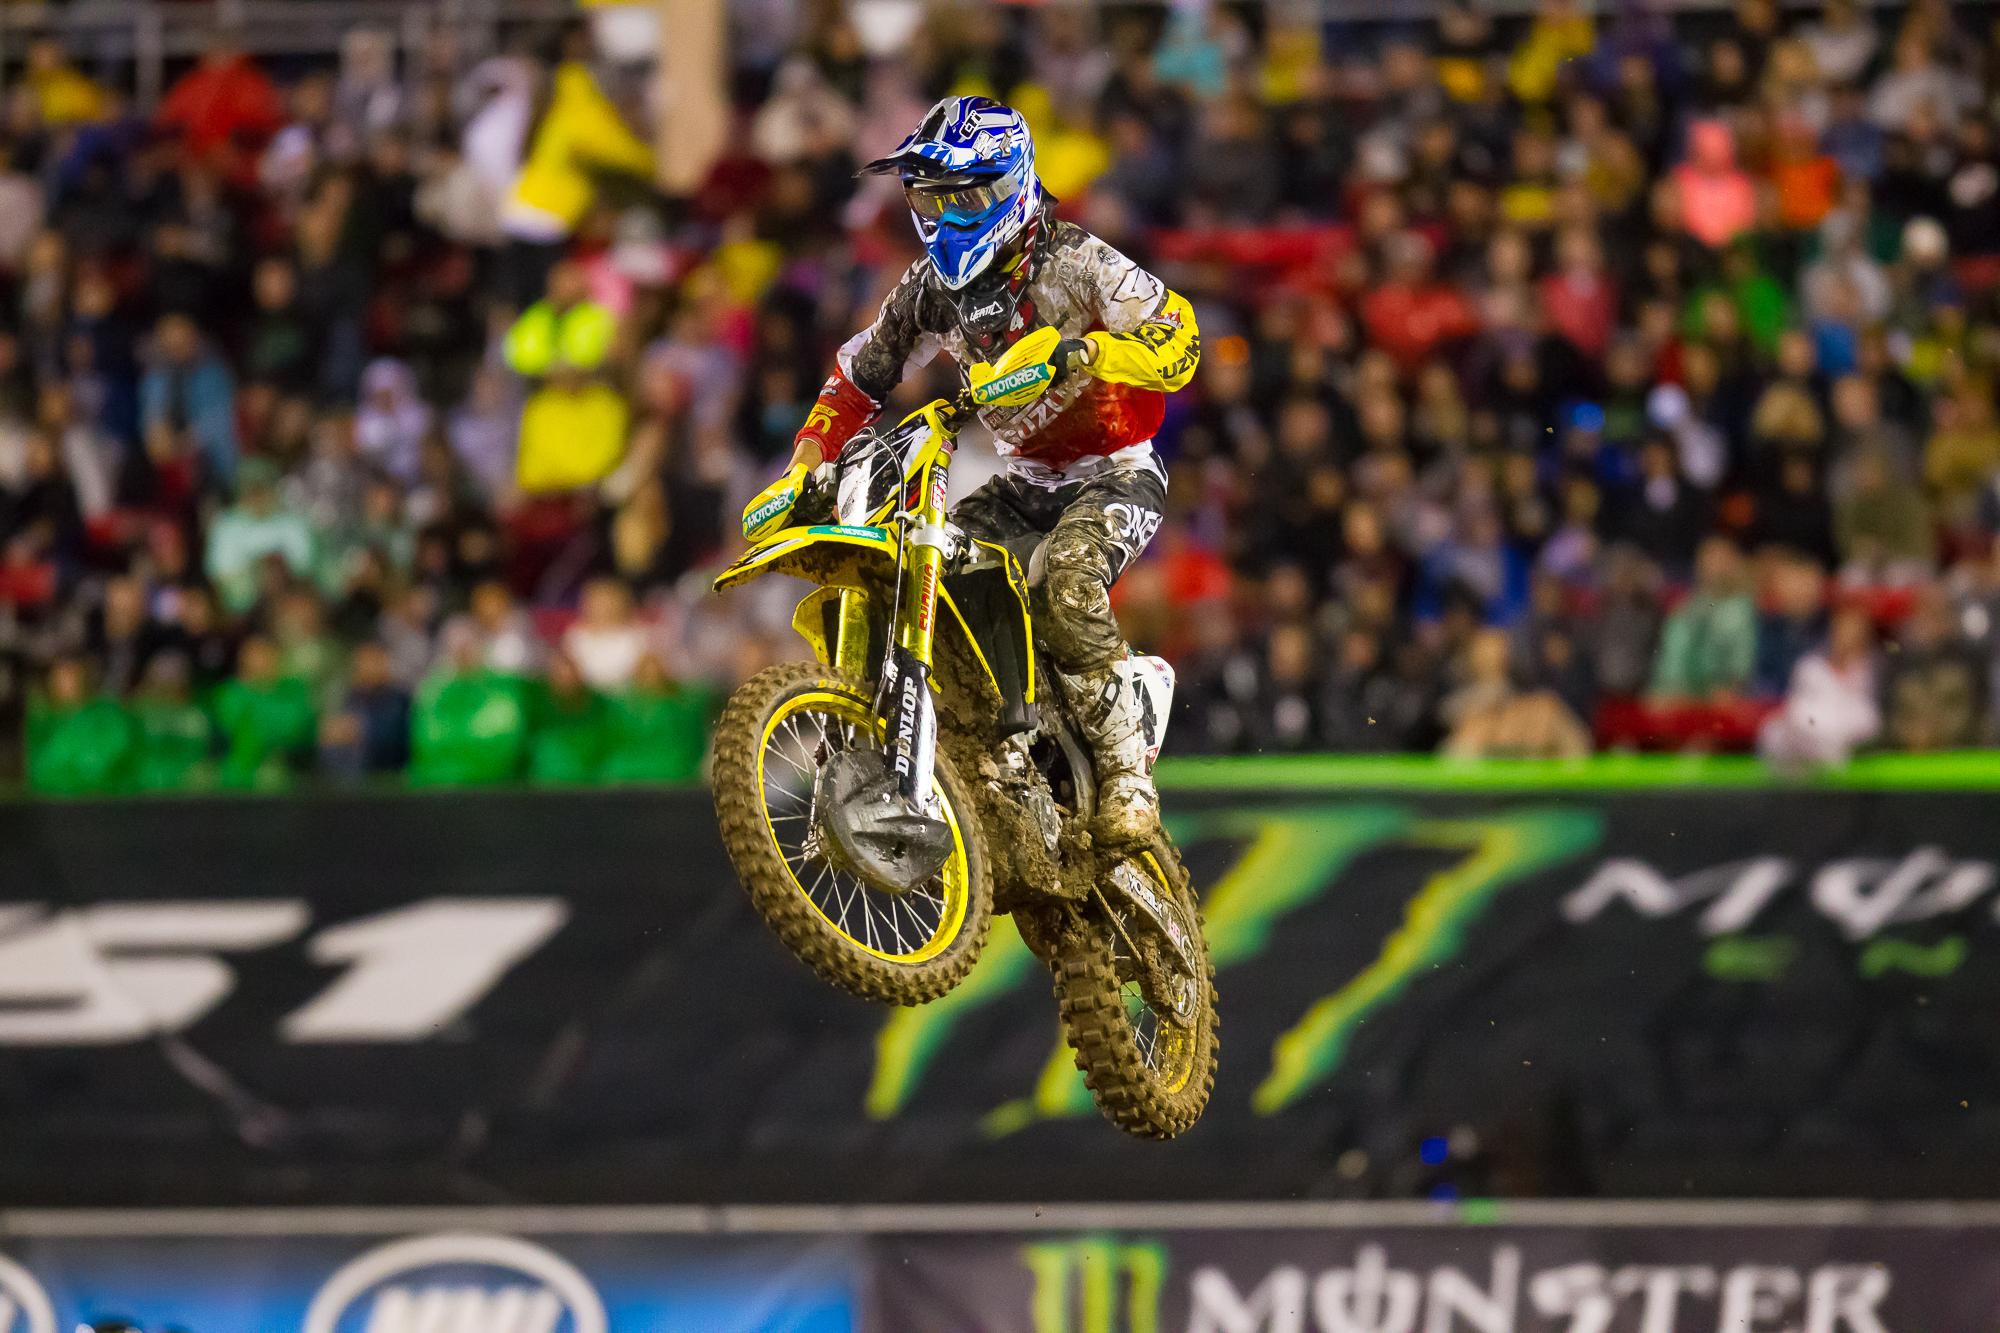 O'Neal rider Blake Baggett at SX Las Vegas